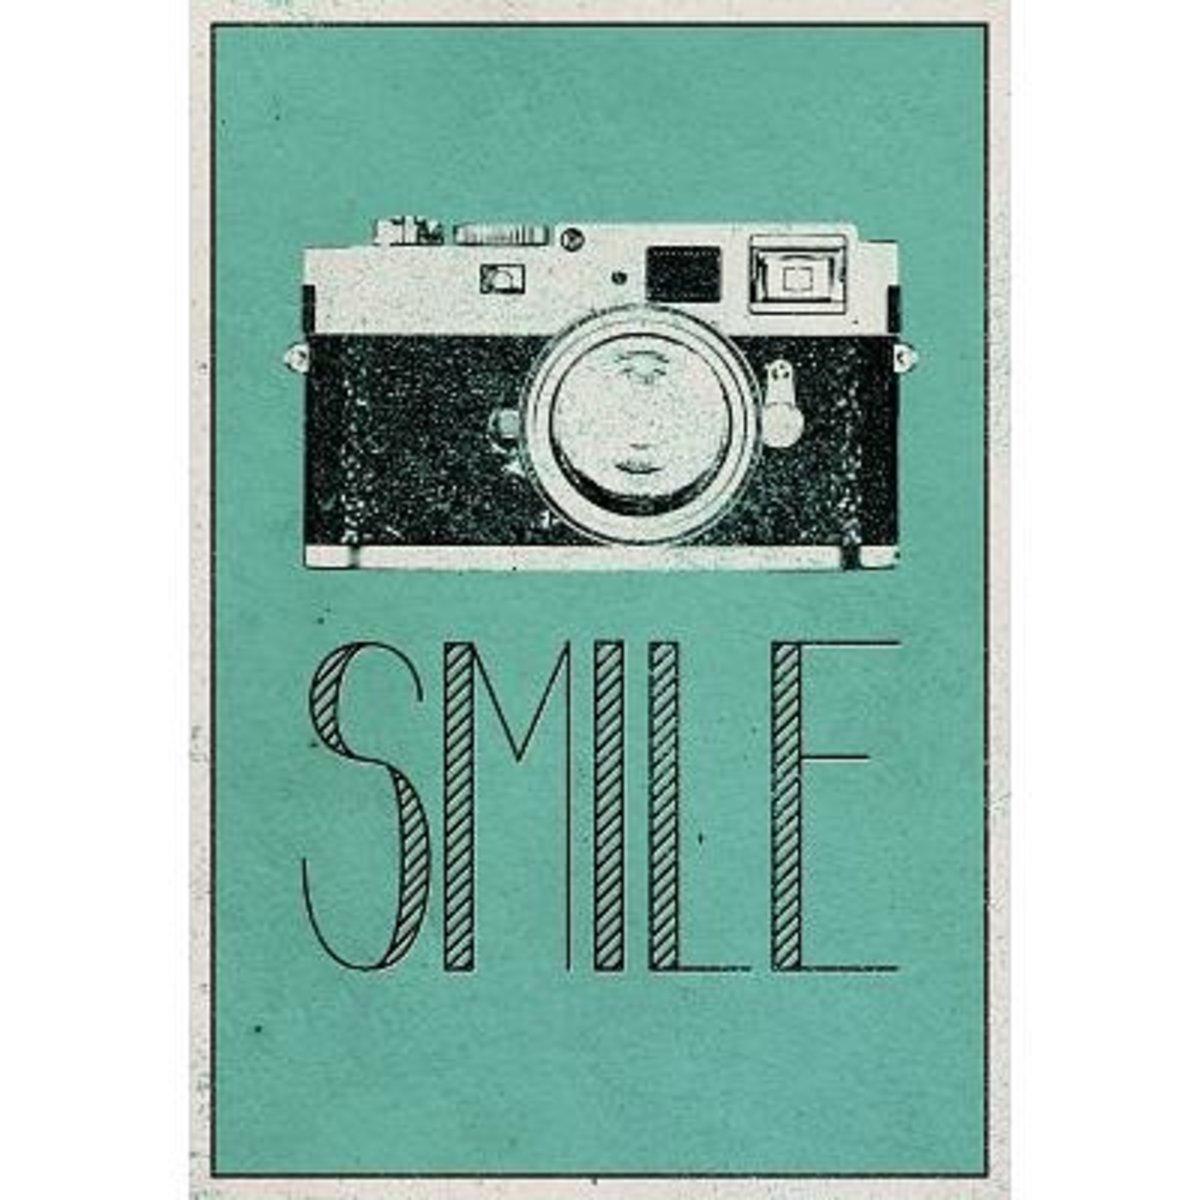 Buy SMILE Poster on Amazon